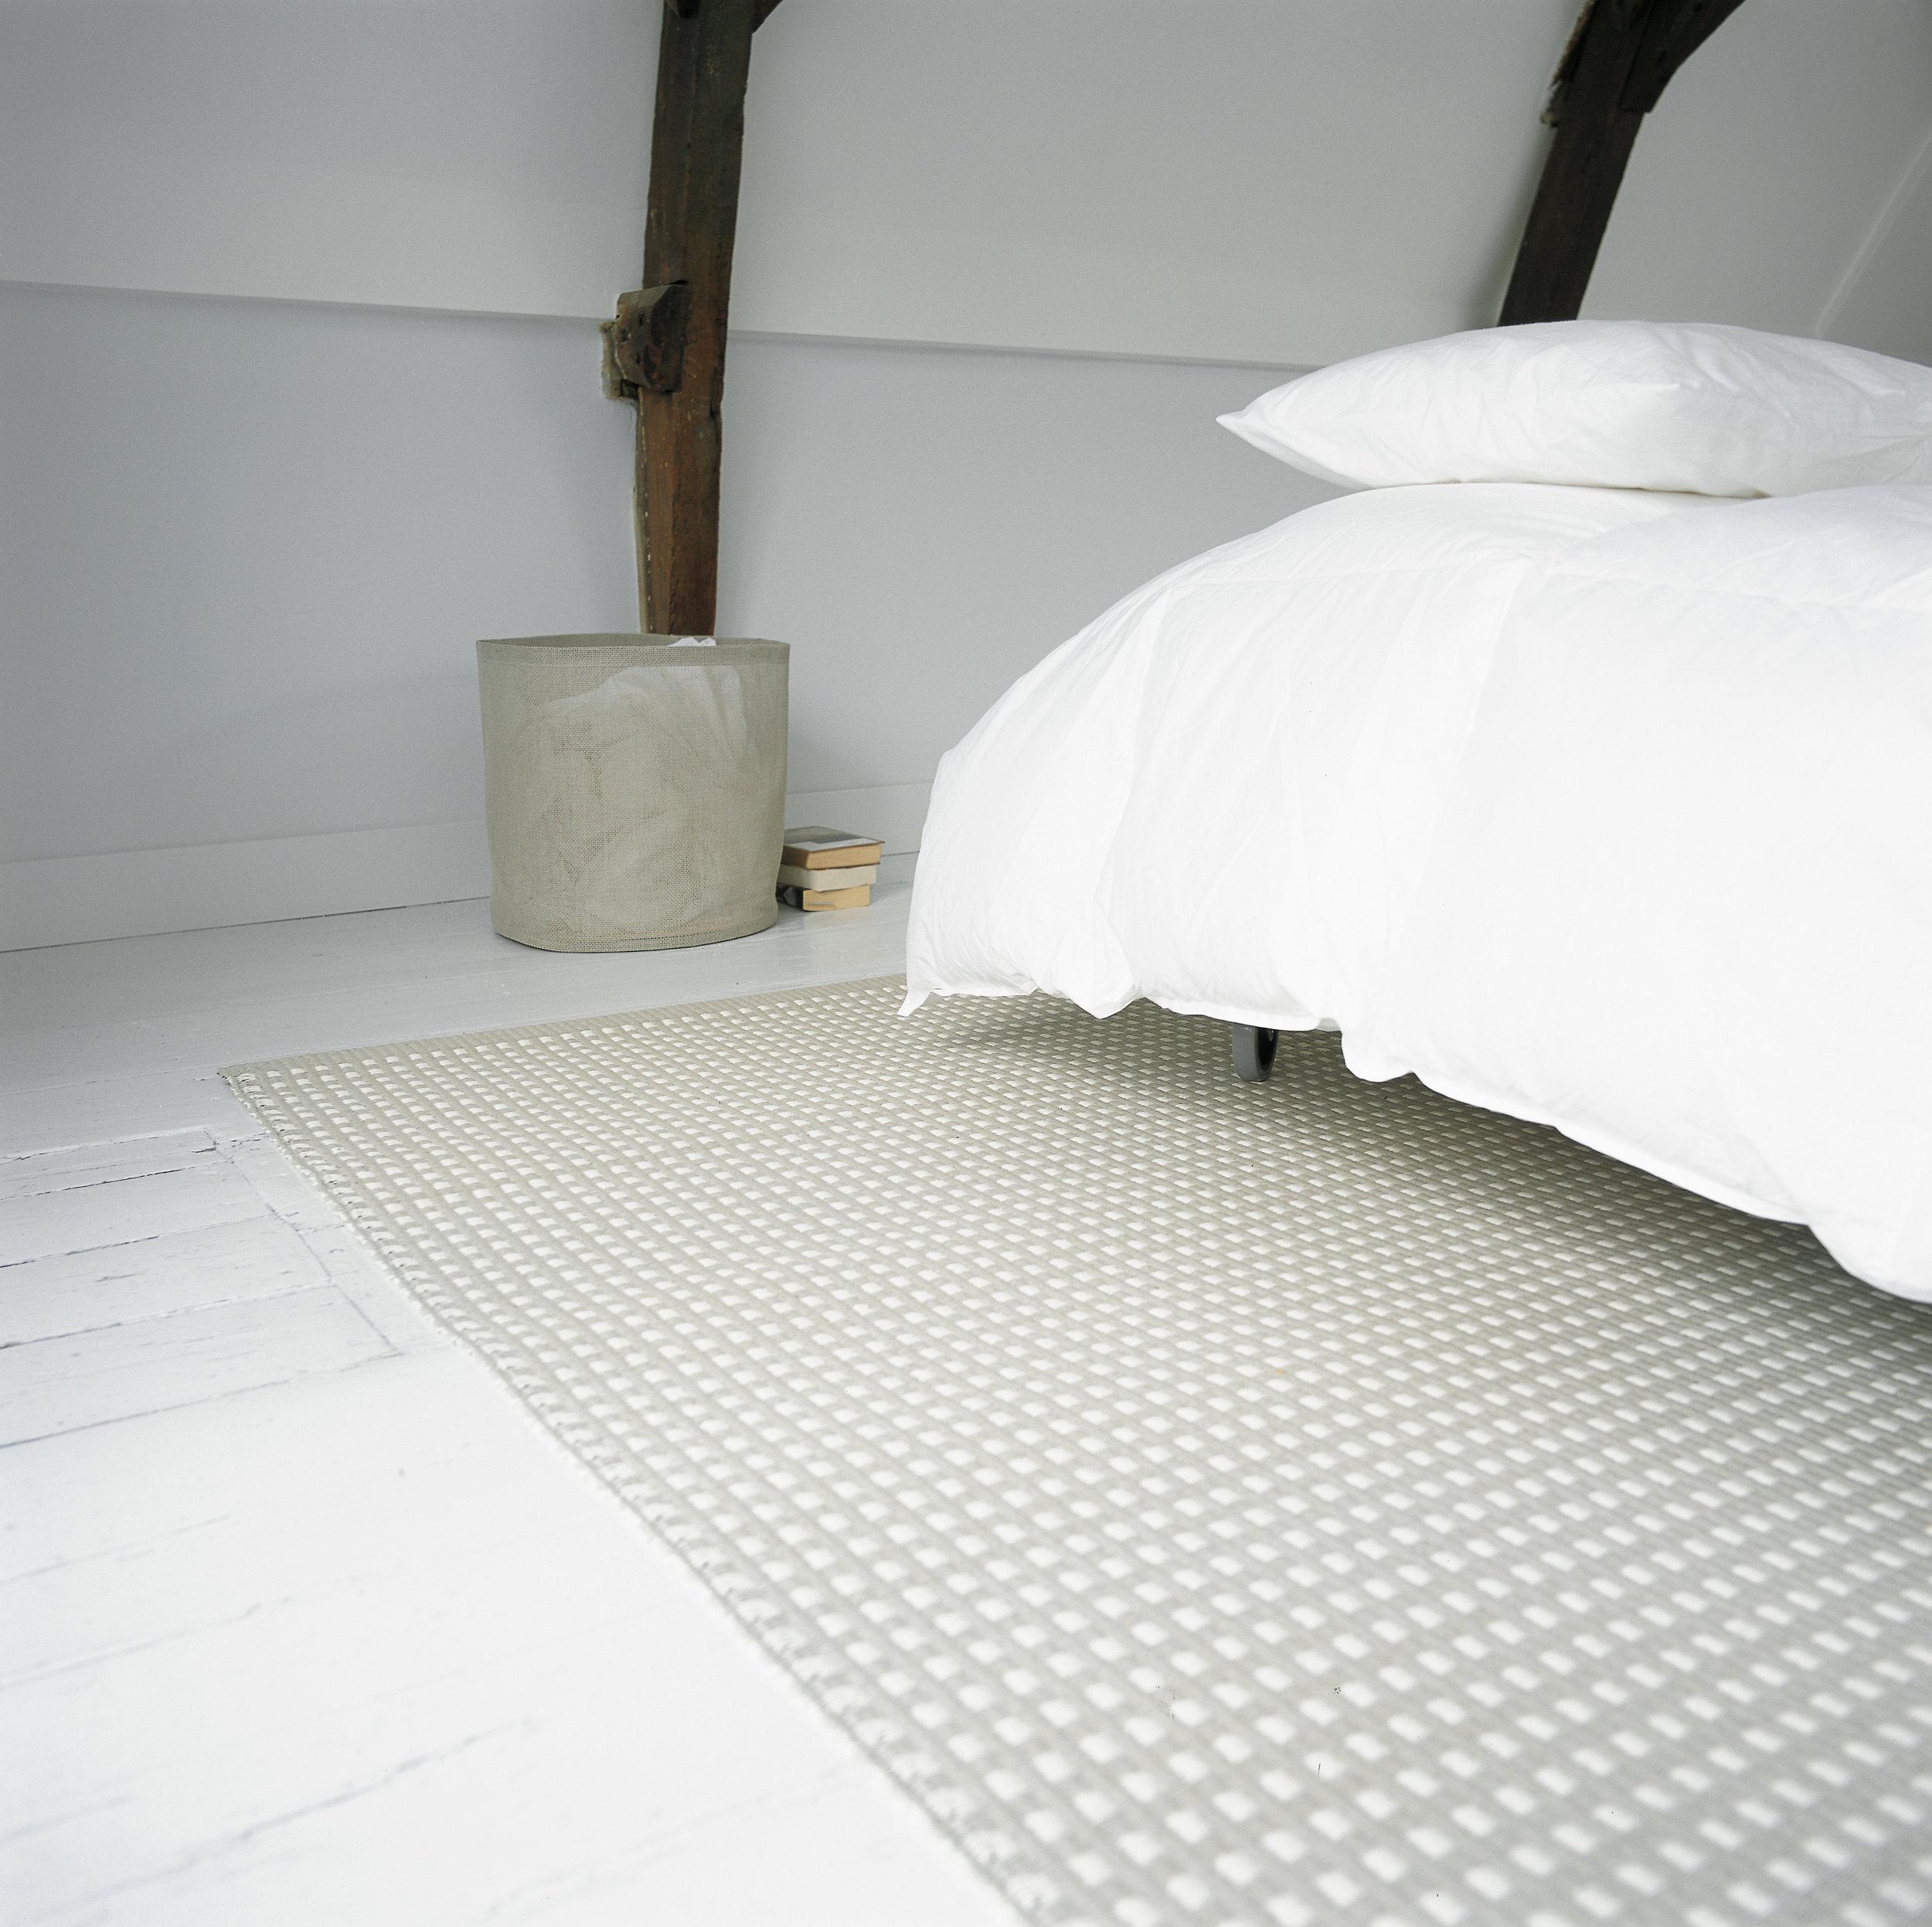 117151 City stone-white paper yarn carpet, 373 Round Zone container stone